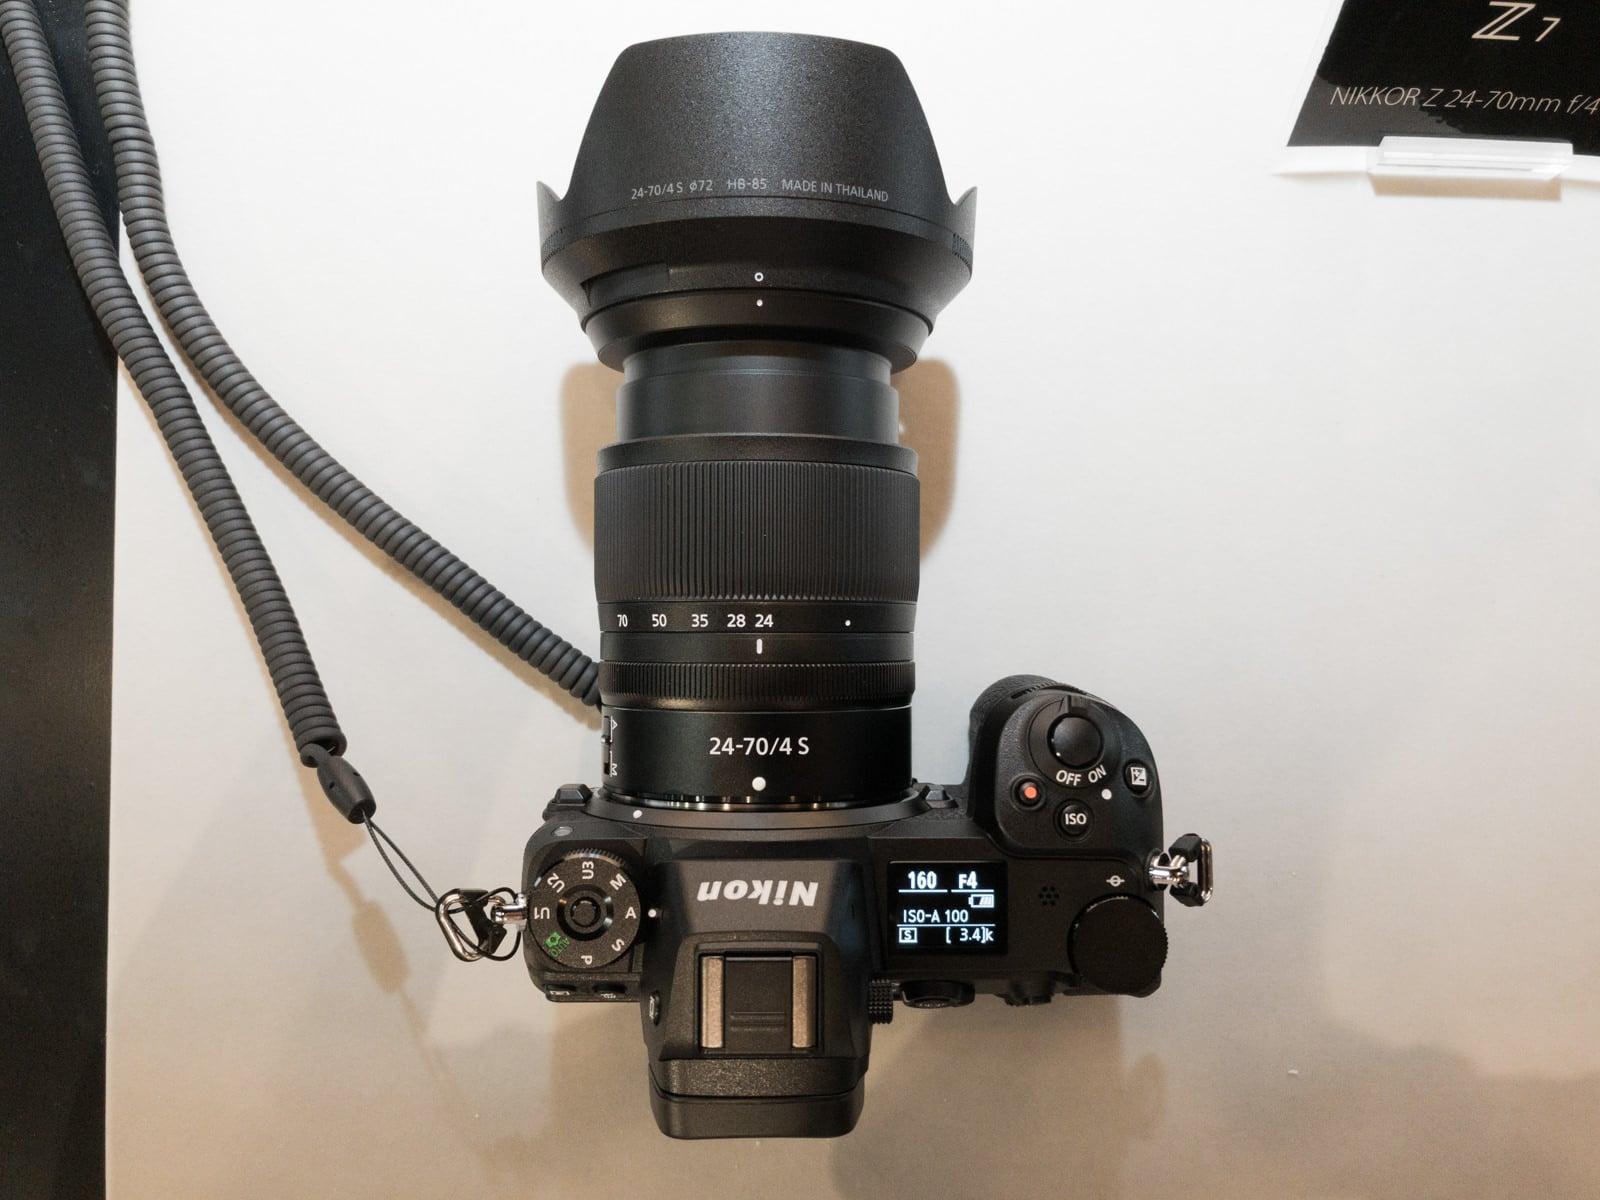 Nikon Z7 24mm時の大きさを上から撮影